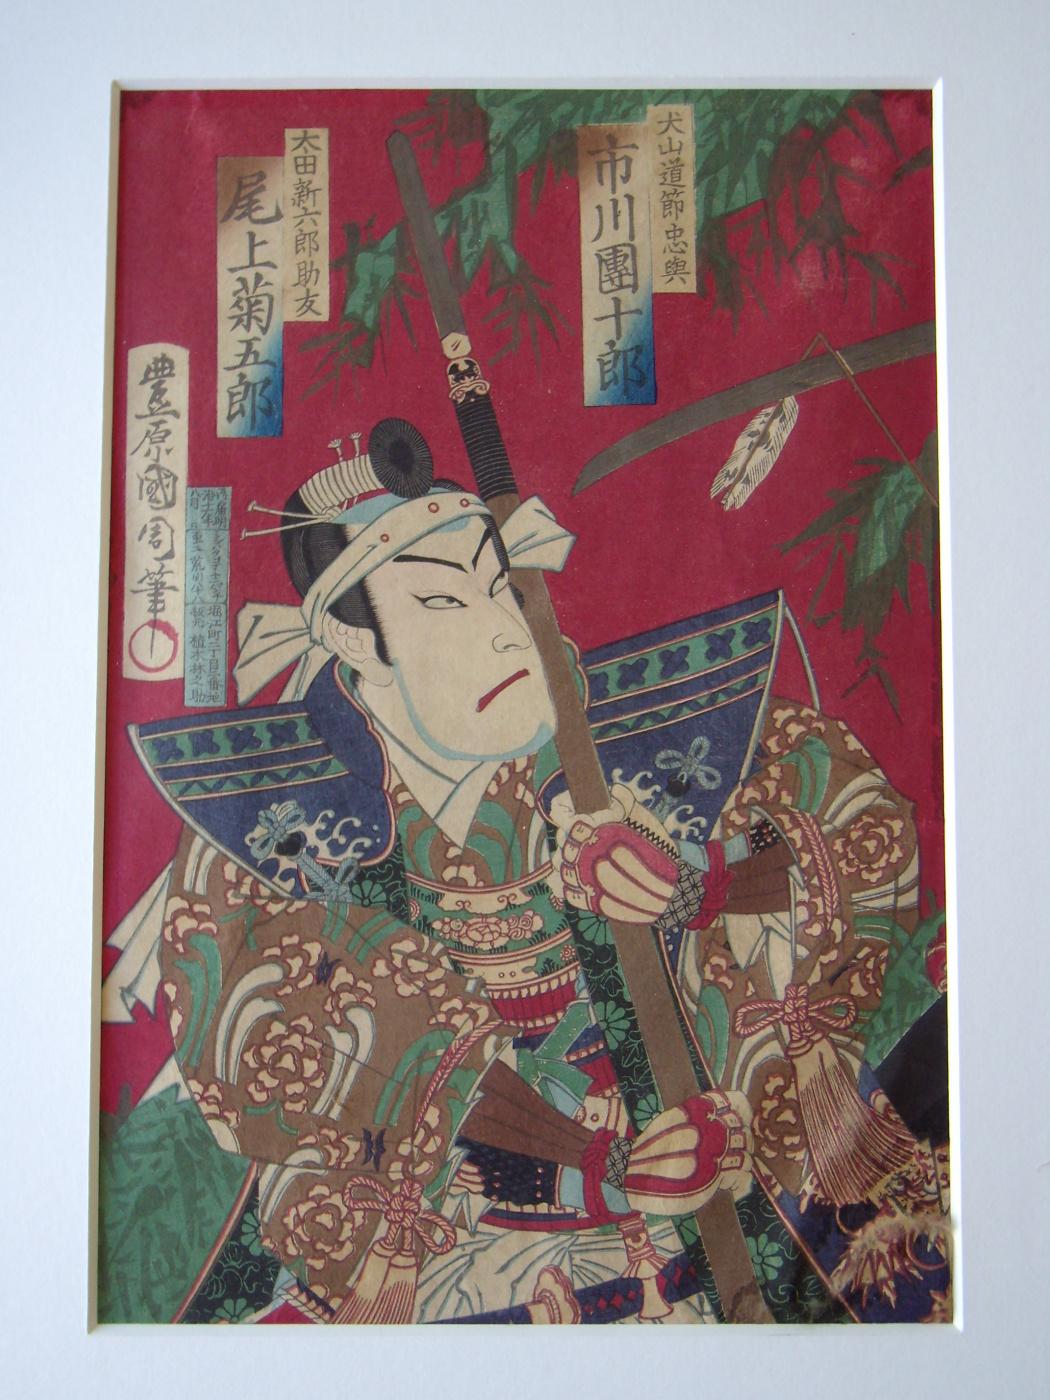 Unknown artist. Samurai with katana sword.